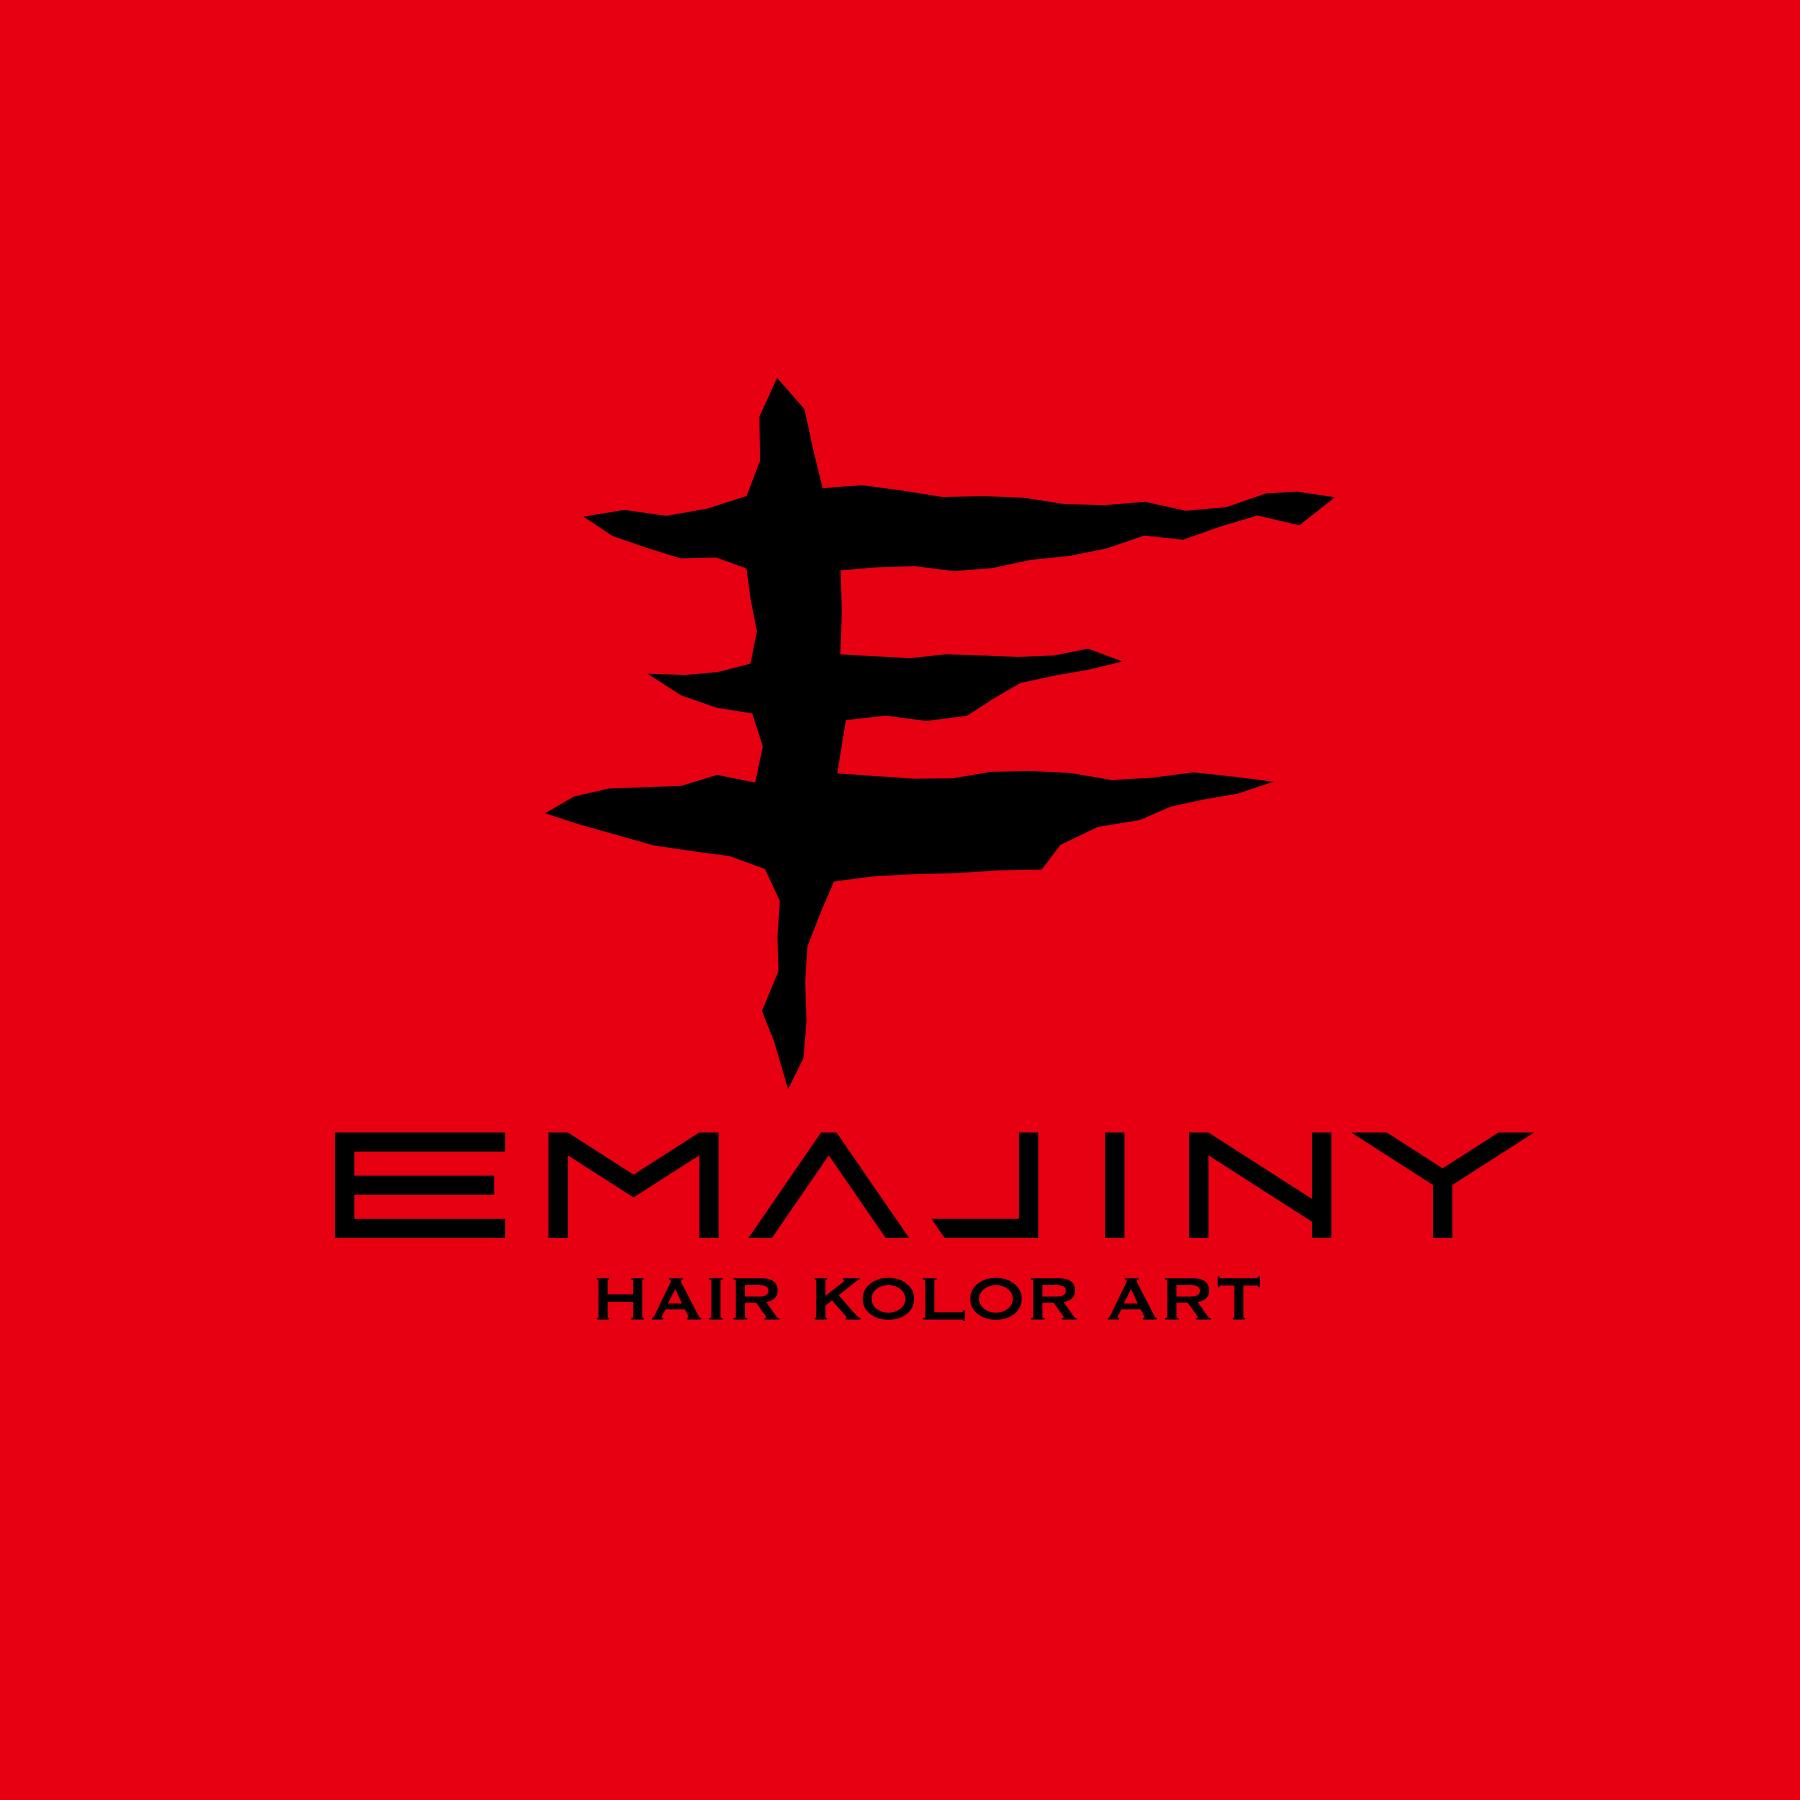 【公式】EMAJINY